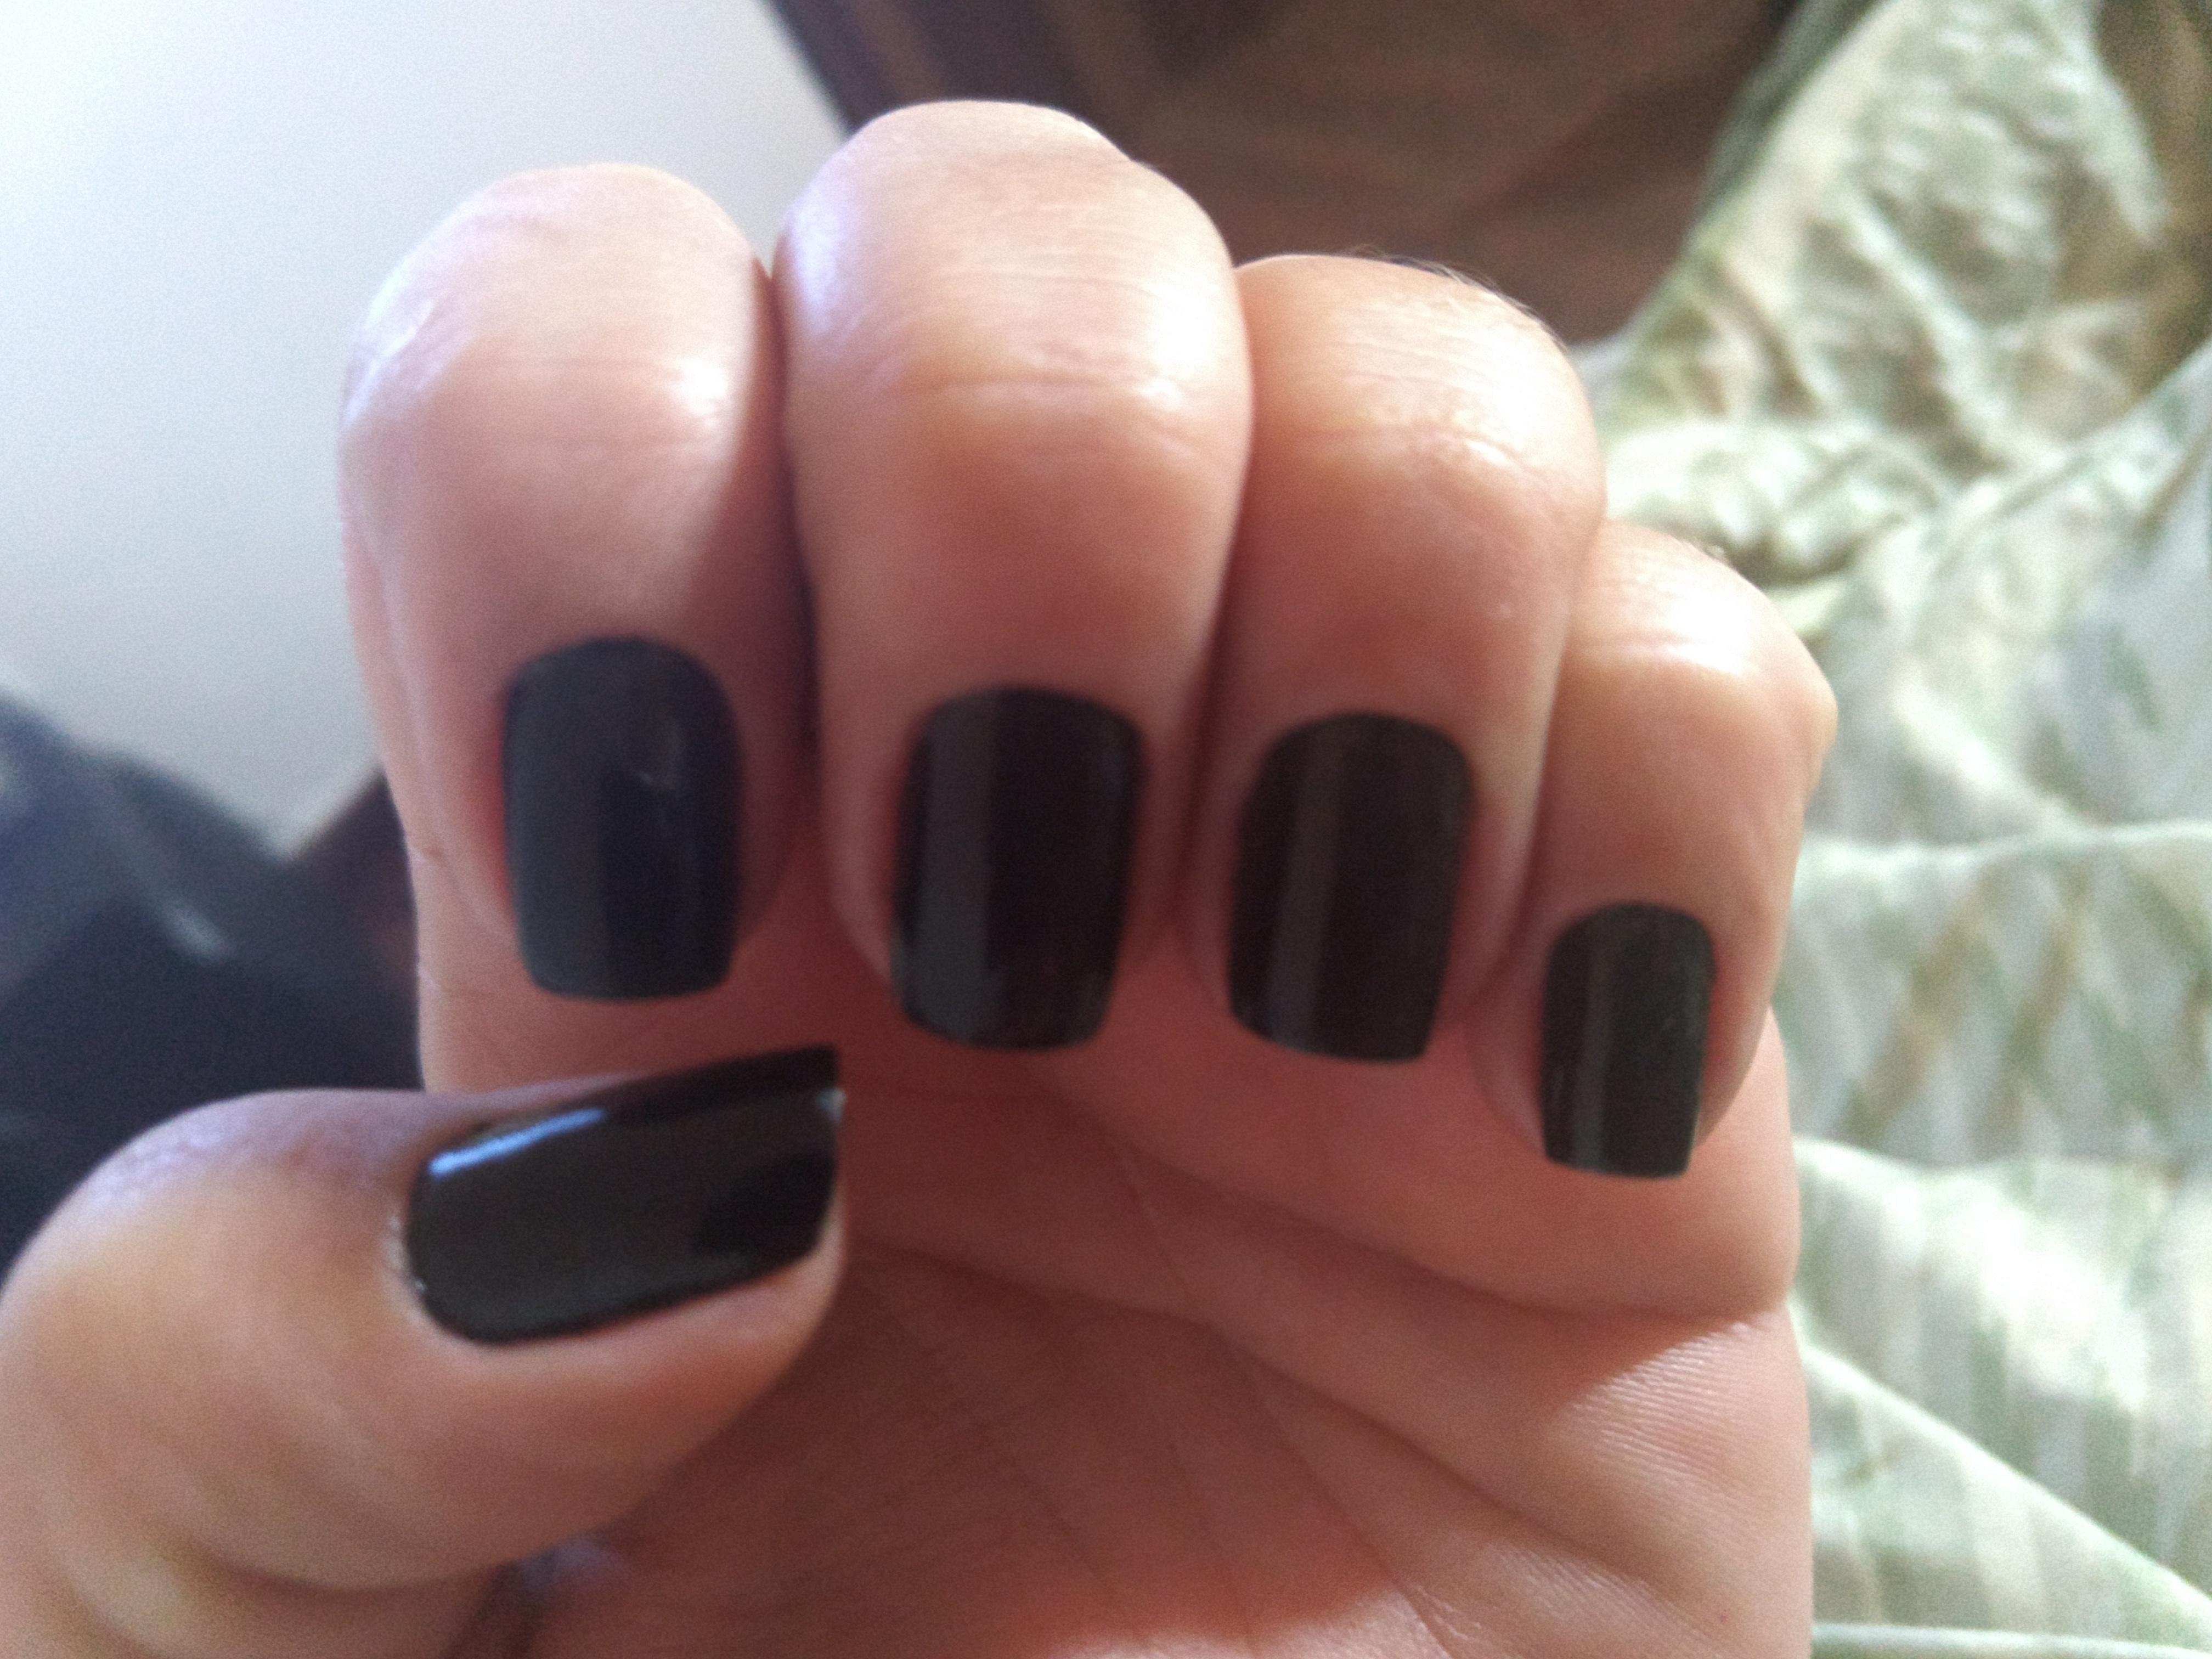 Amo meu trabalho. unha manicure e pedicure